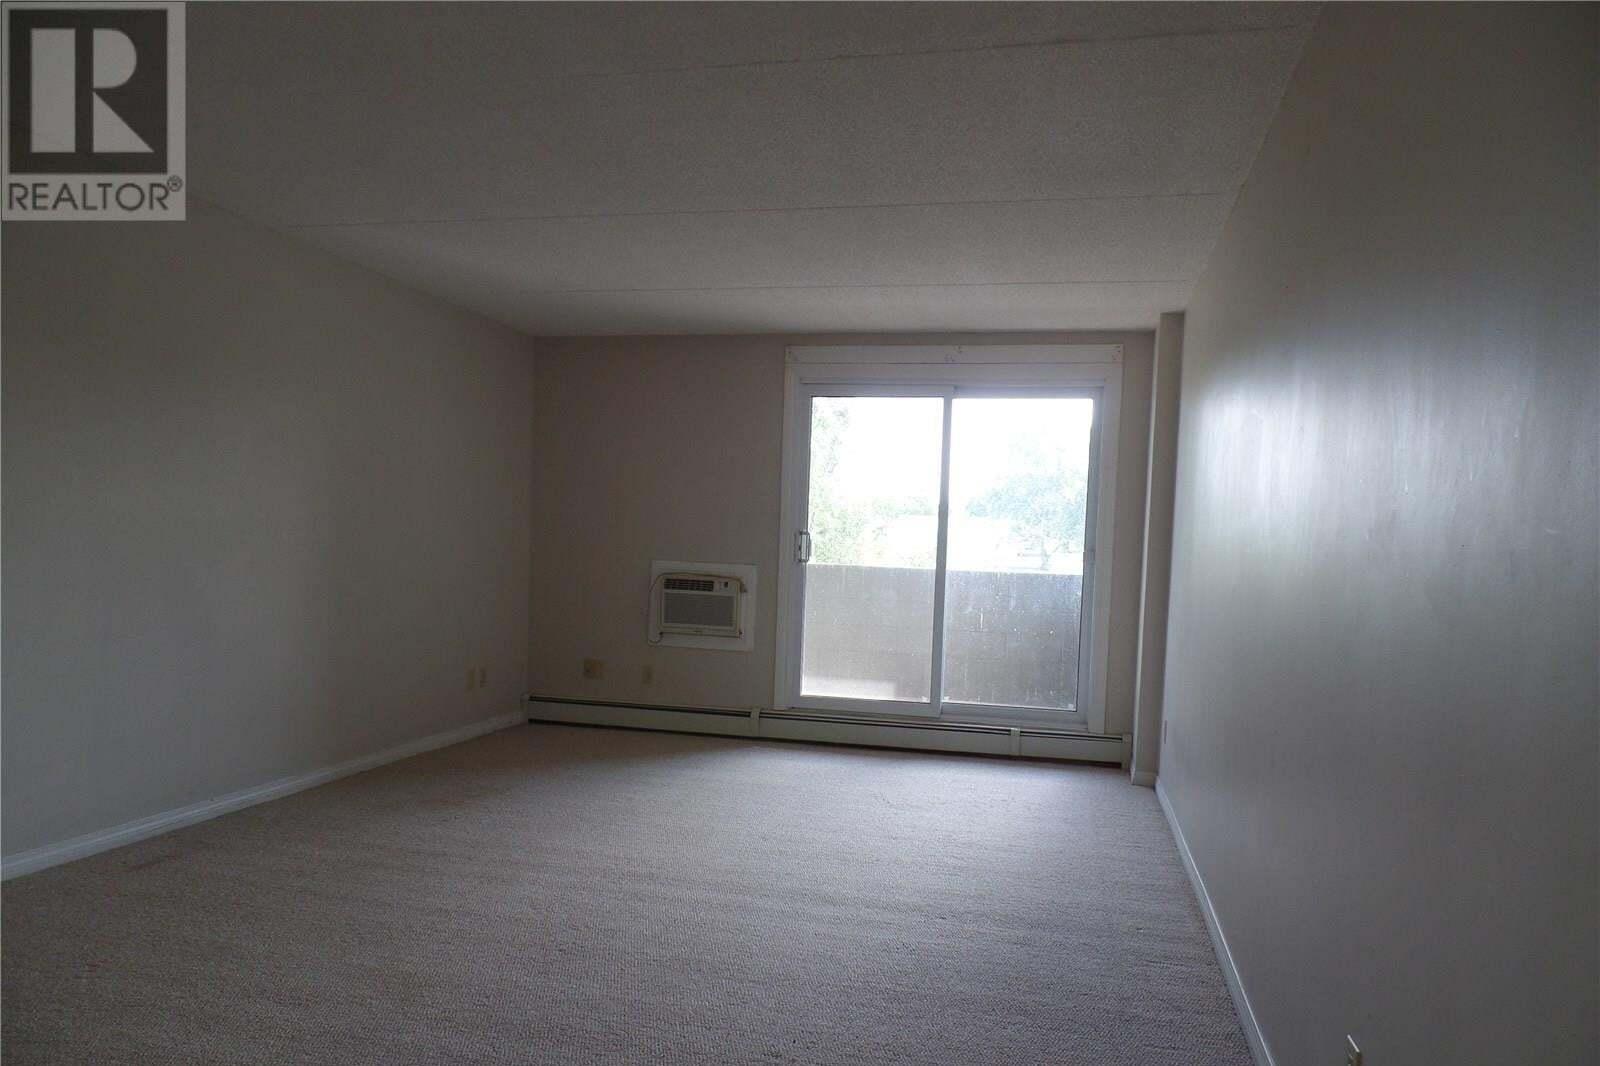 Condo for sale at 590 Laurier St W Unit 206 Moose Jaw Saskatchewan - MLS: SK827406